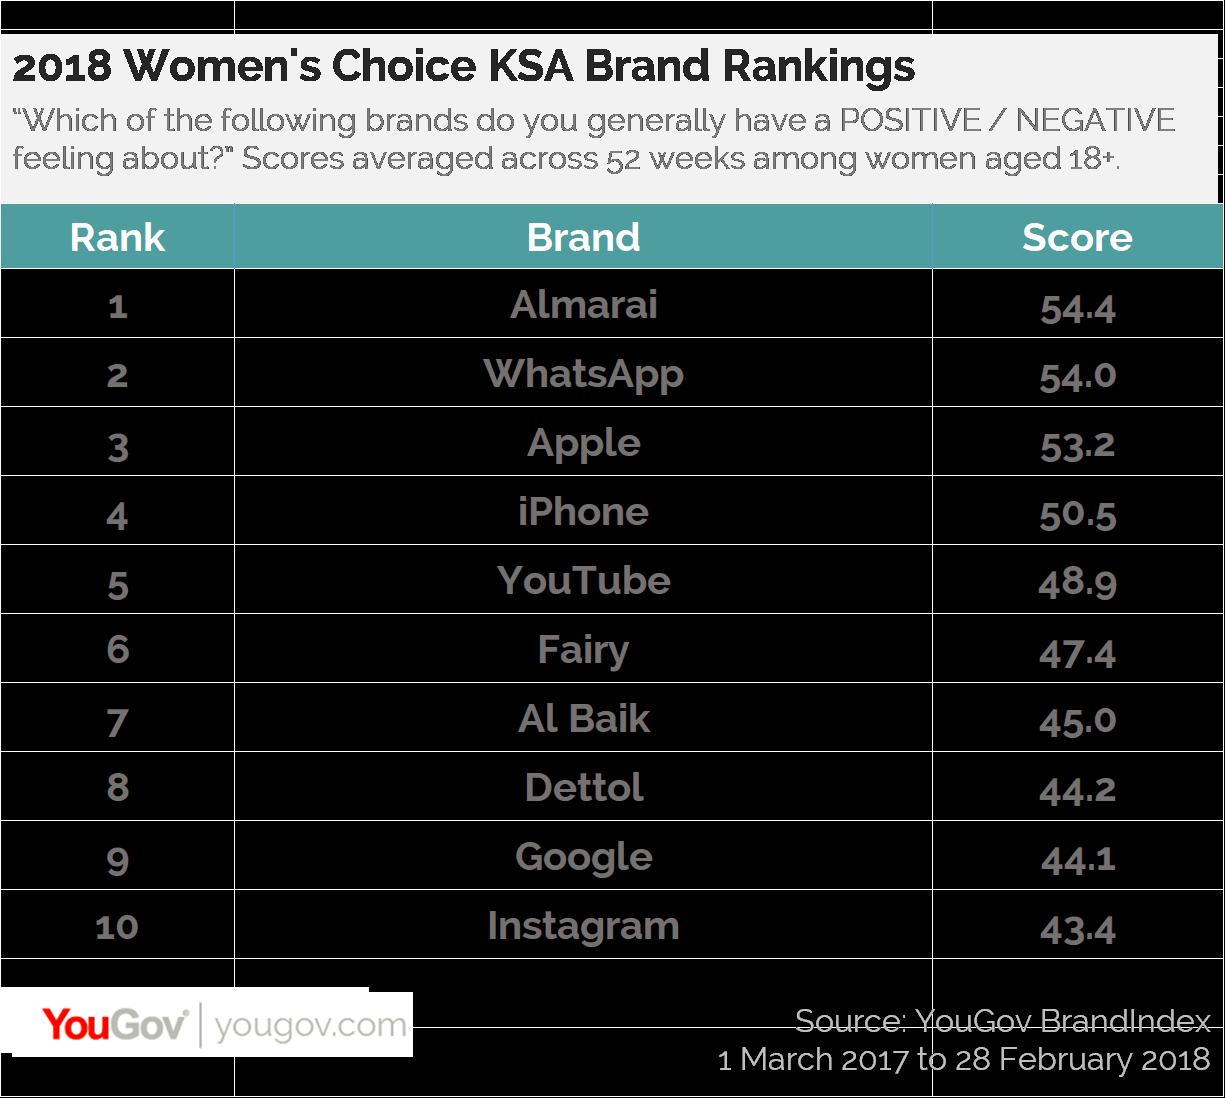 2018 Women's Choice KSA Brand Rankings